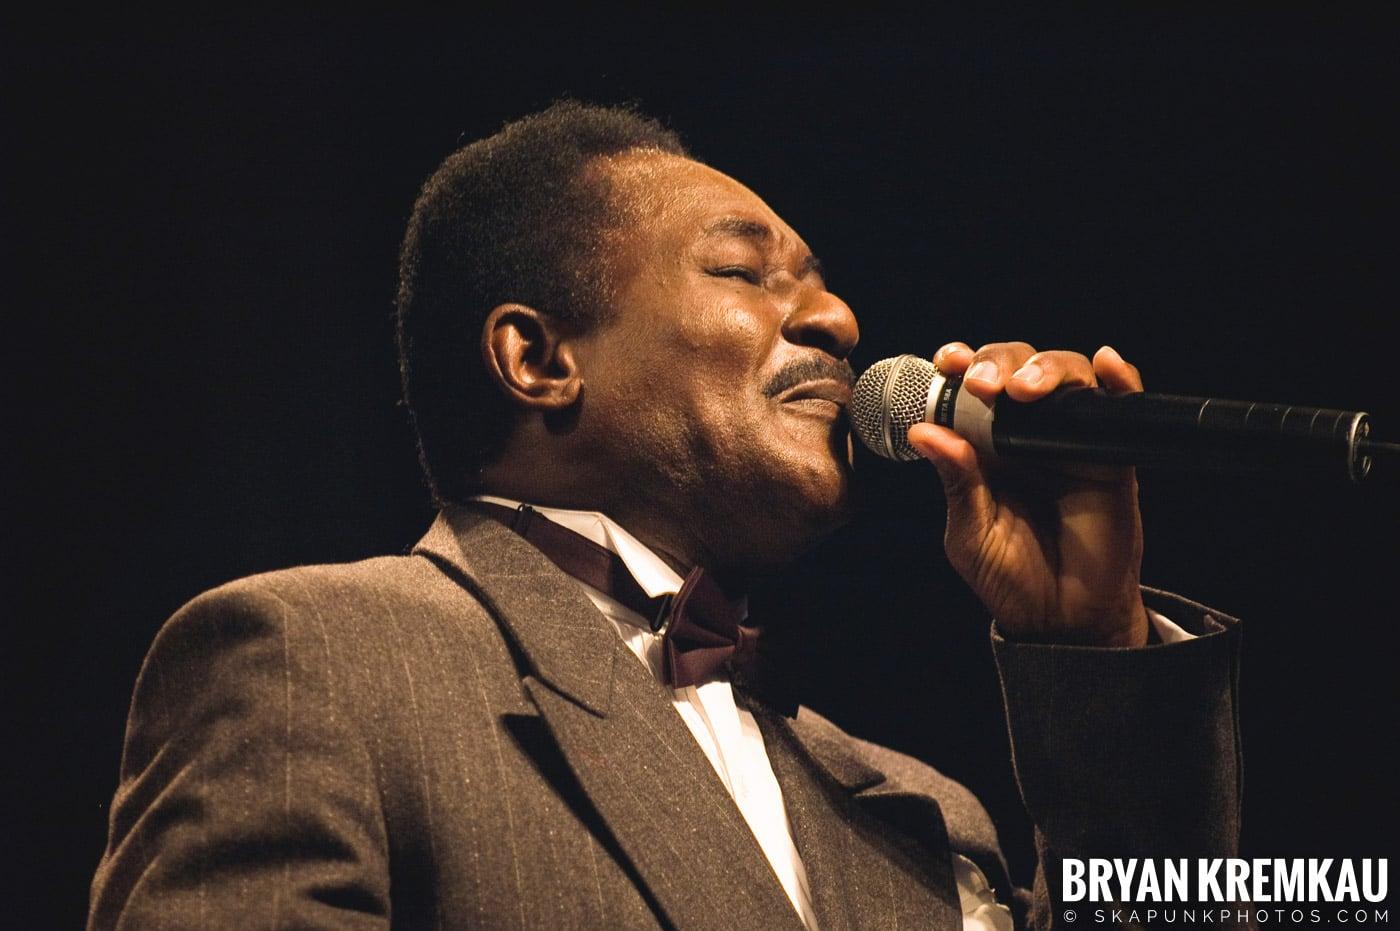 Pat Kelly @ Vintage Reggae Fest - Hammerstein Ballroom, NYC - 12.16.07 (10)